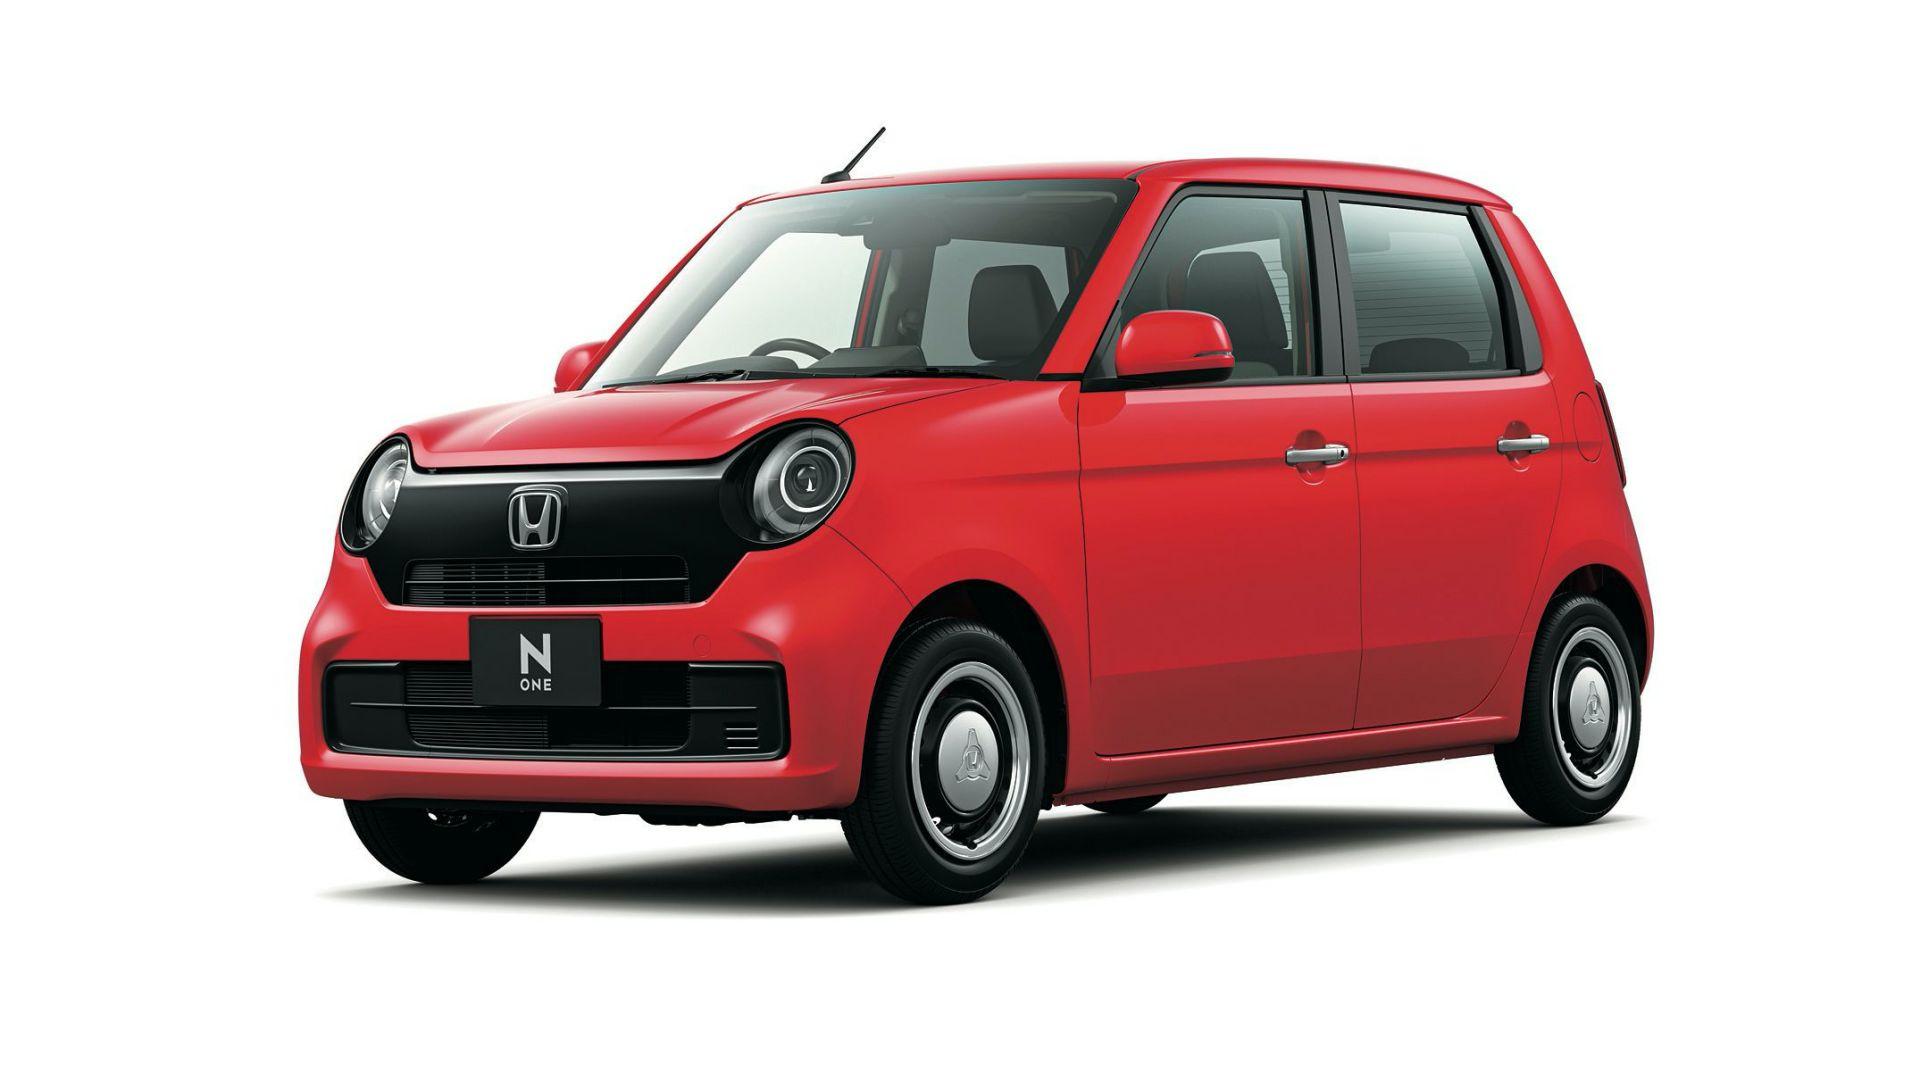 Honda Luncurkan Mobil Mungil Terbaru, Cek Harganya - JPNN.com